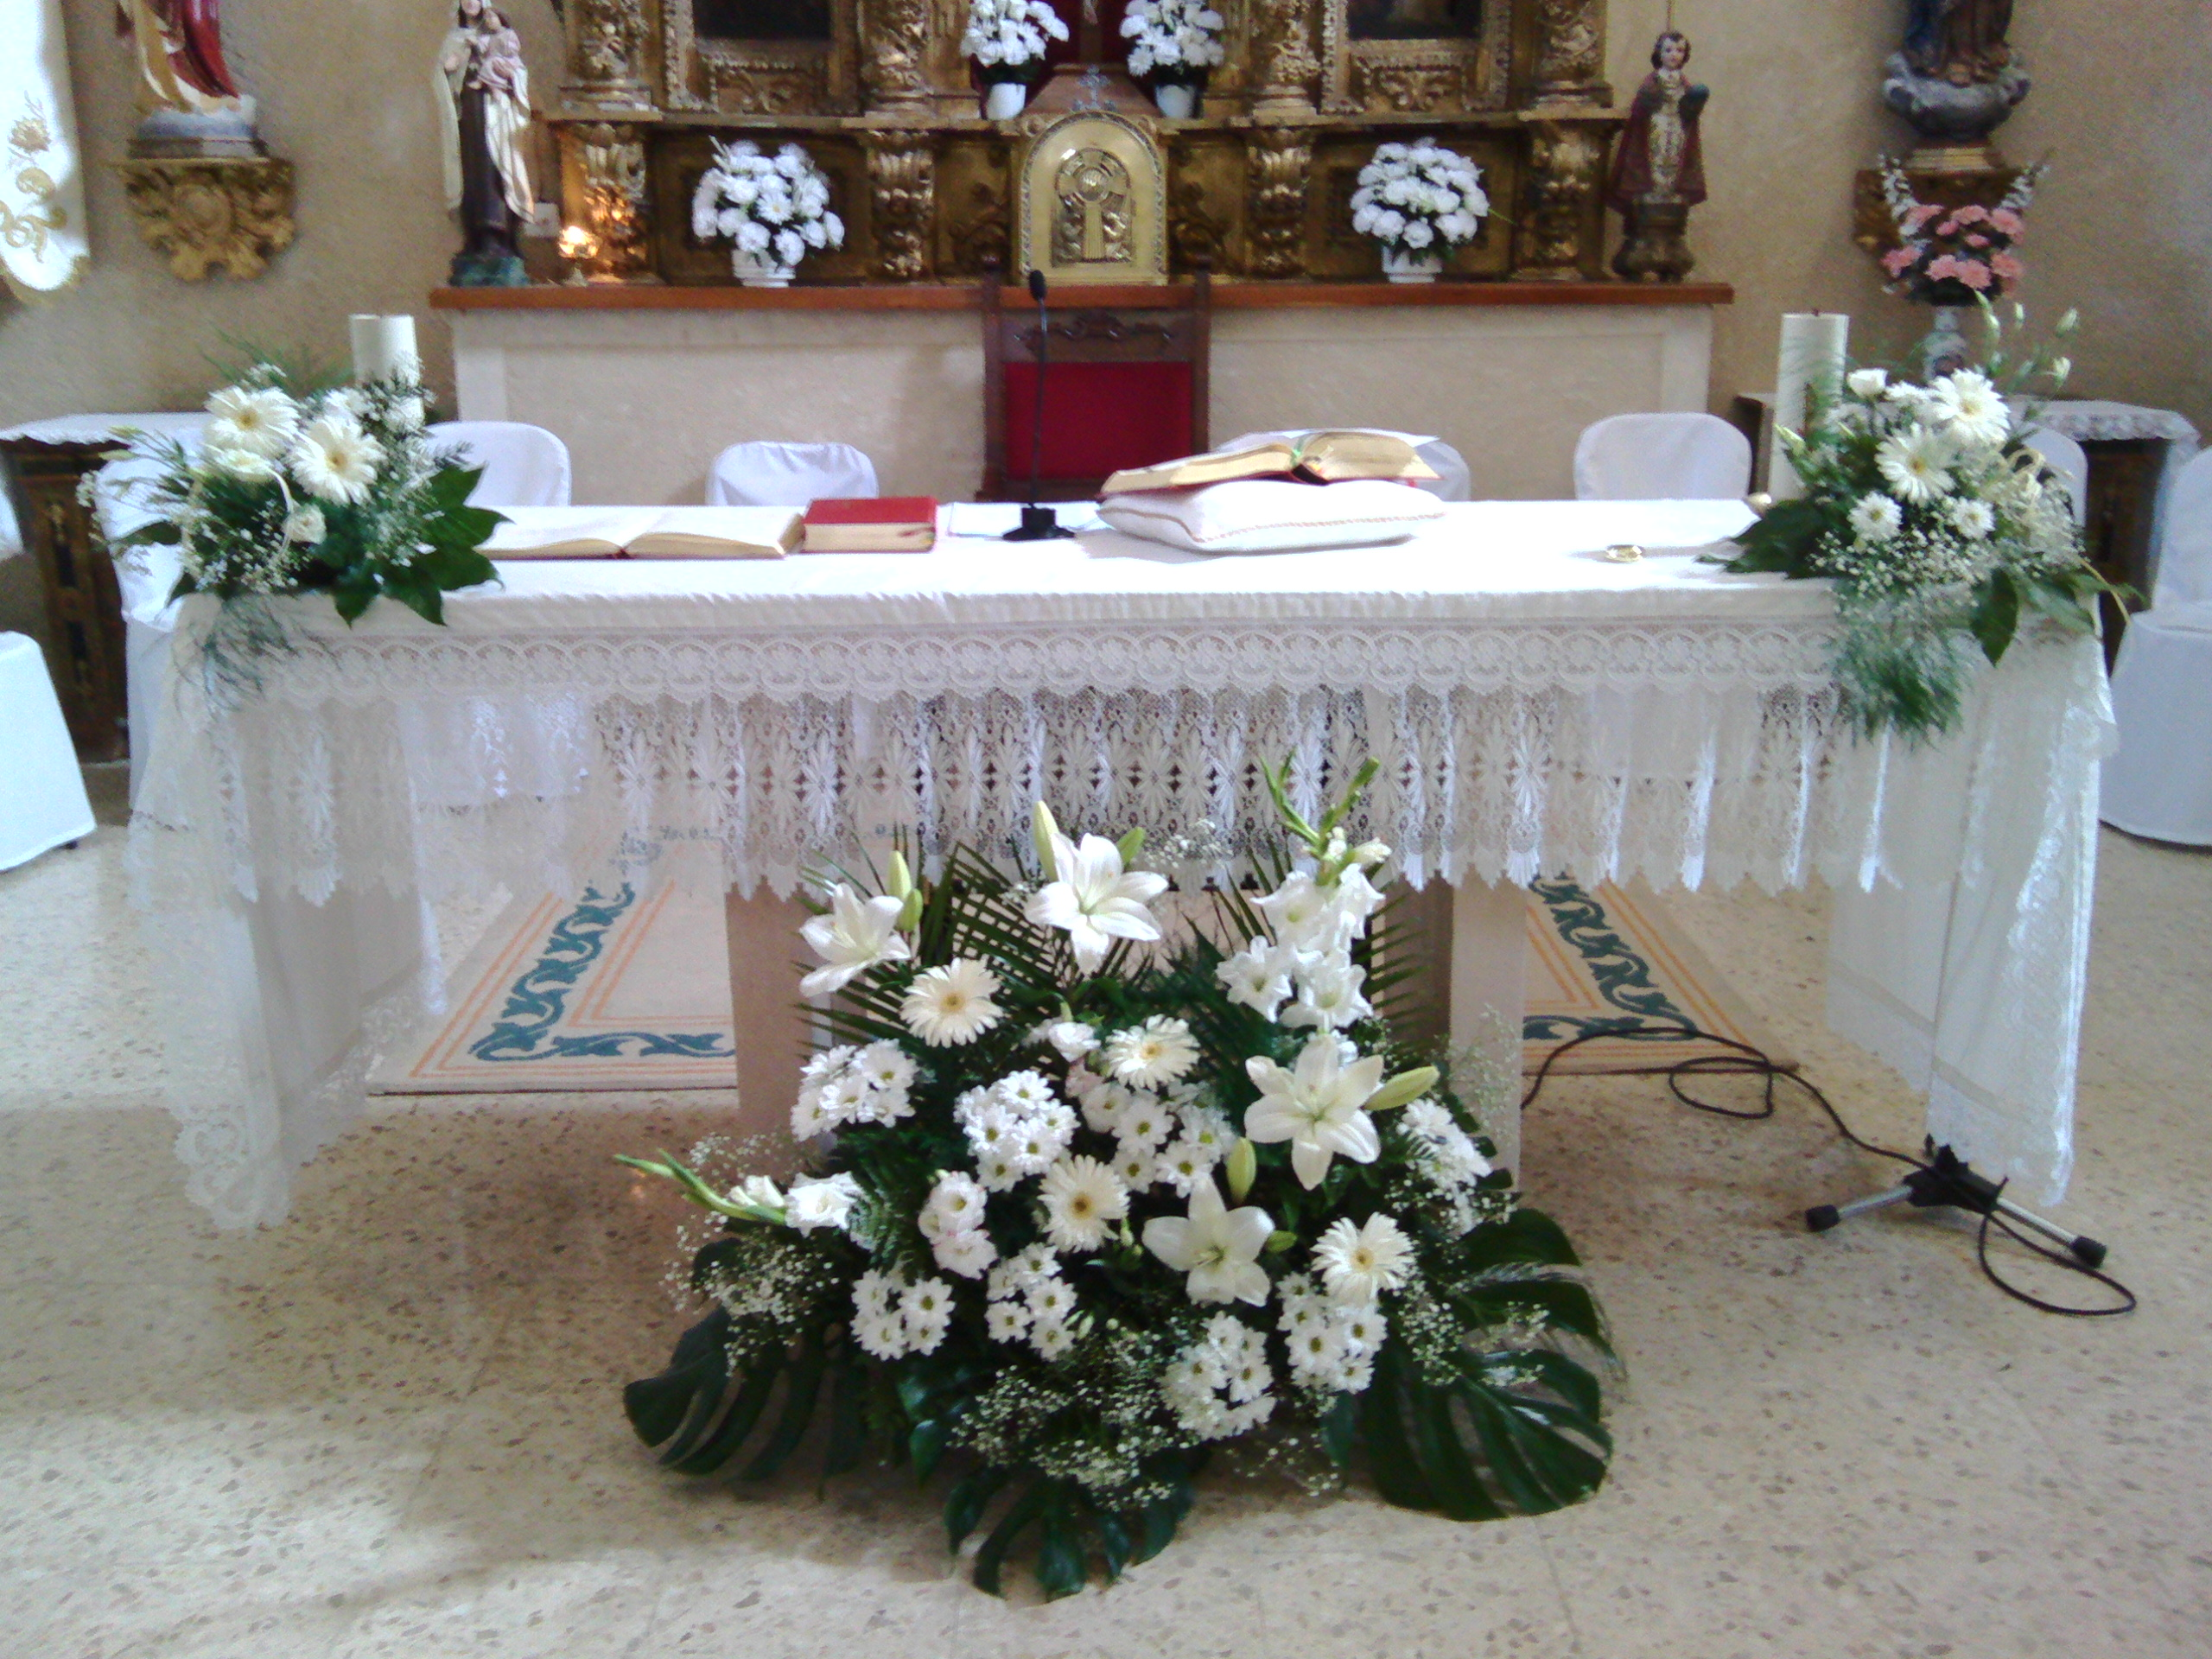 Decoración De Bodas Flor De Loto Floristería En Segovia